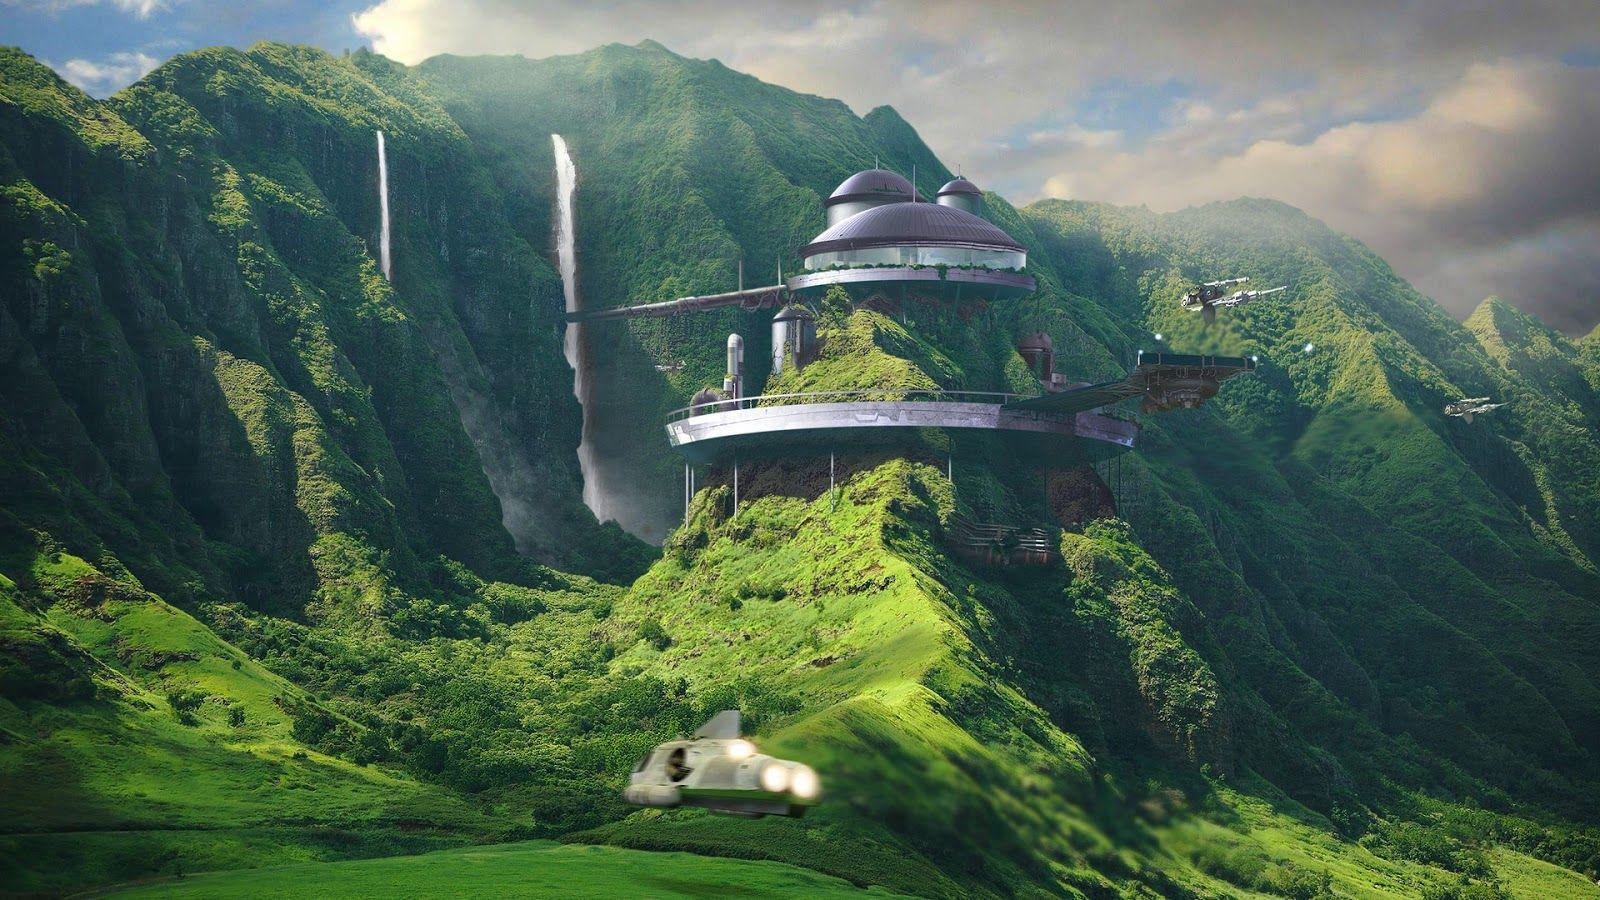 Futuristic landscape city in the heart of mountain for Mountain designs garden city